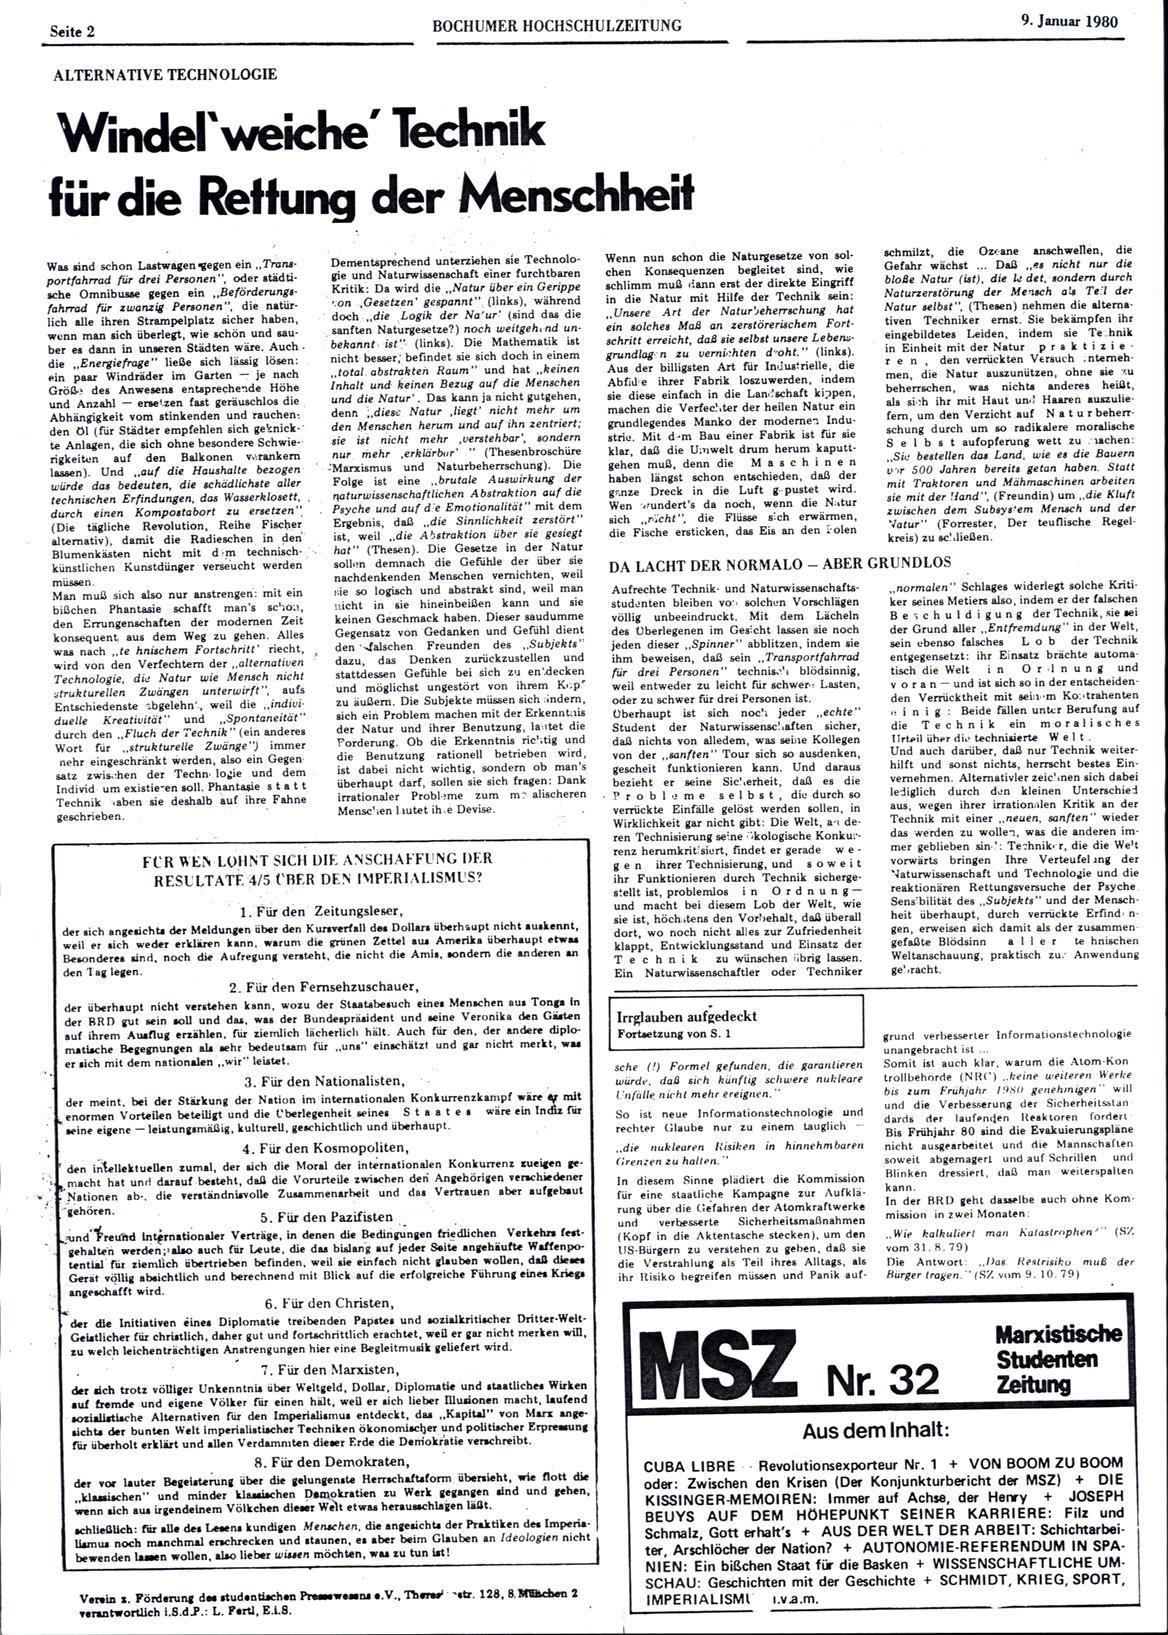 Bochum_BHZ_19800109_Sonder_002